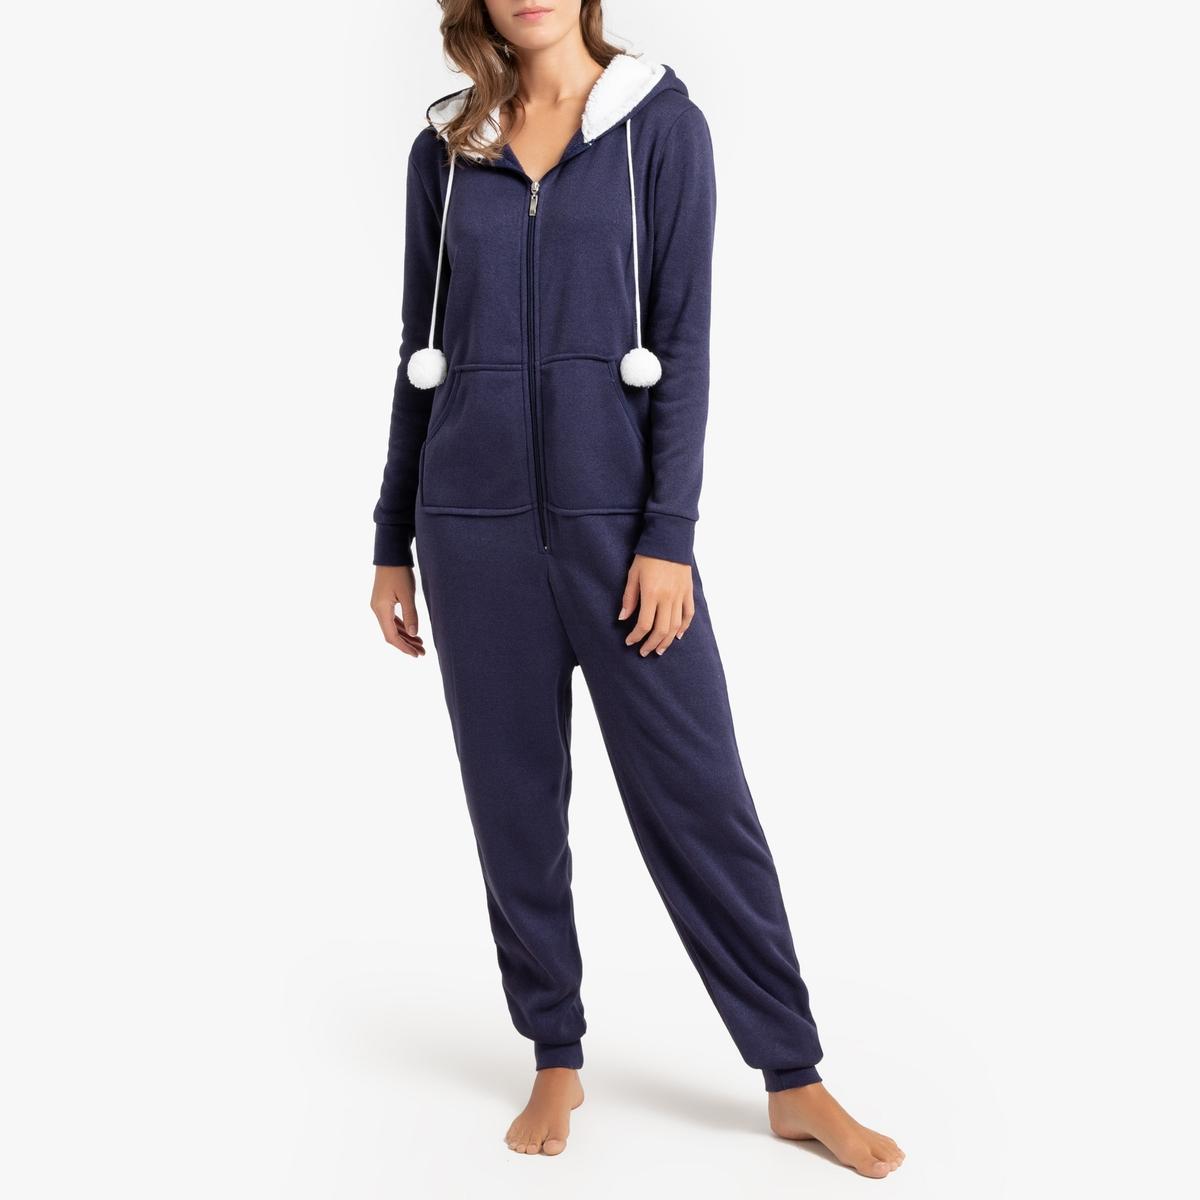 Mono pijama con capucha cálida